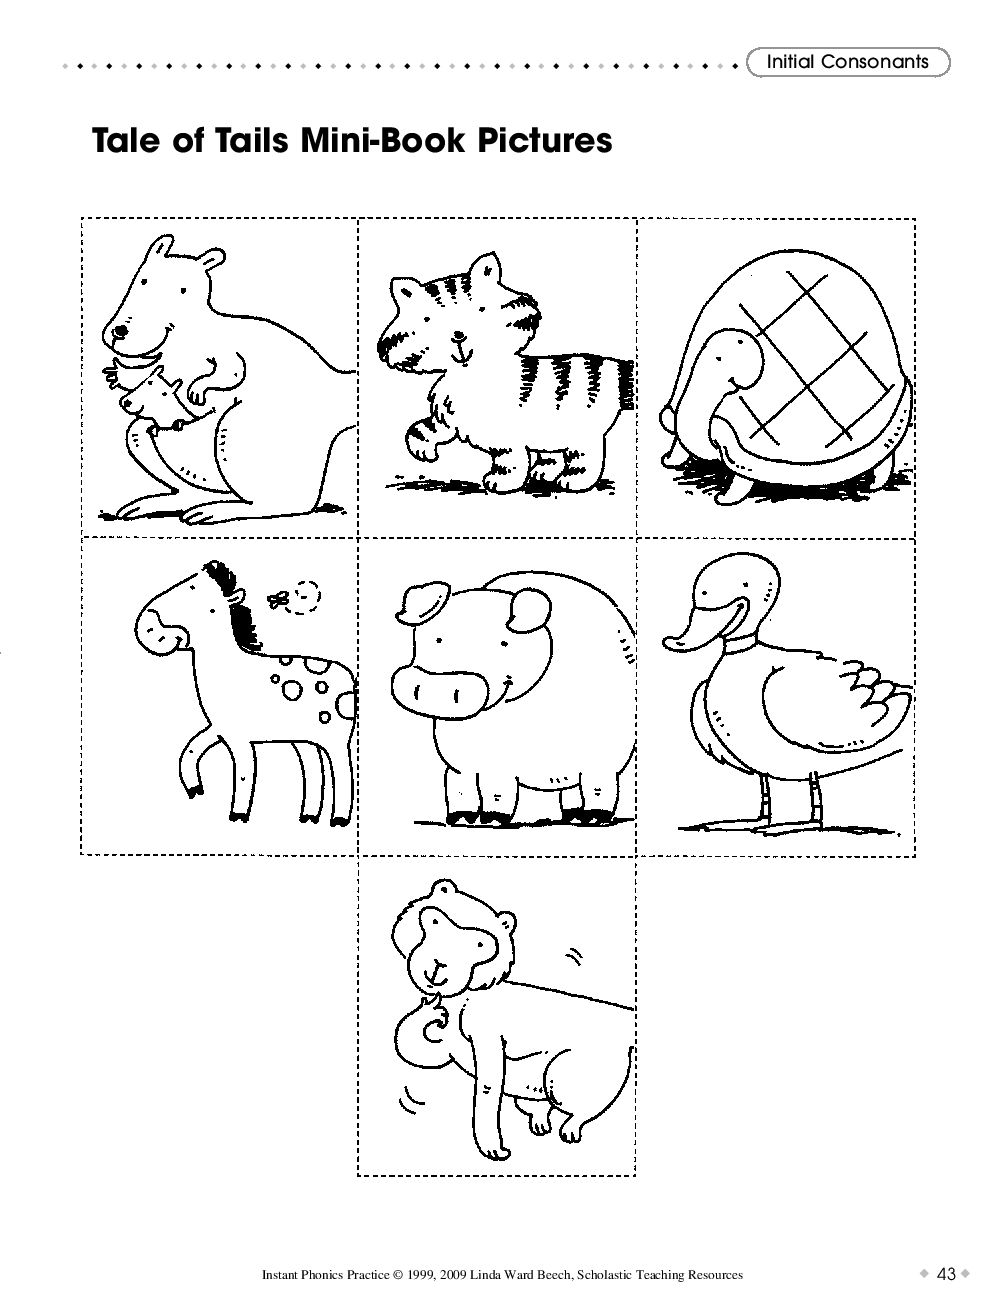 18 English For Kids Kindergartens English Lessons For Kids Alphabet Worksheets Kindergarten Learning English For Kids [ 1305 x 1005 Pixel ]